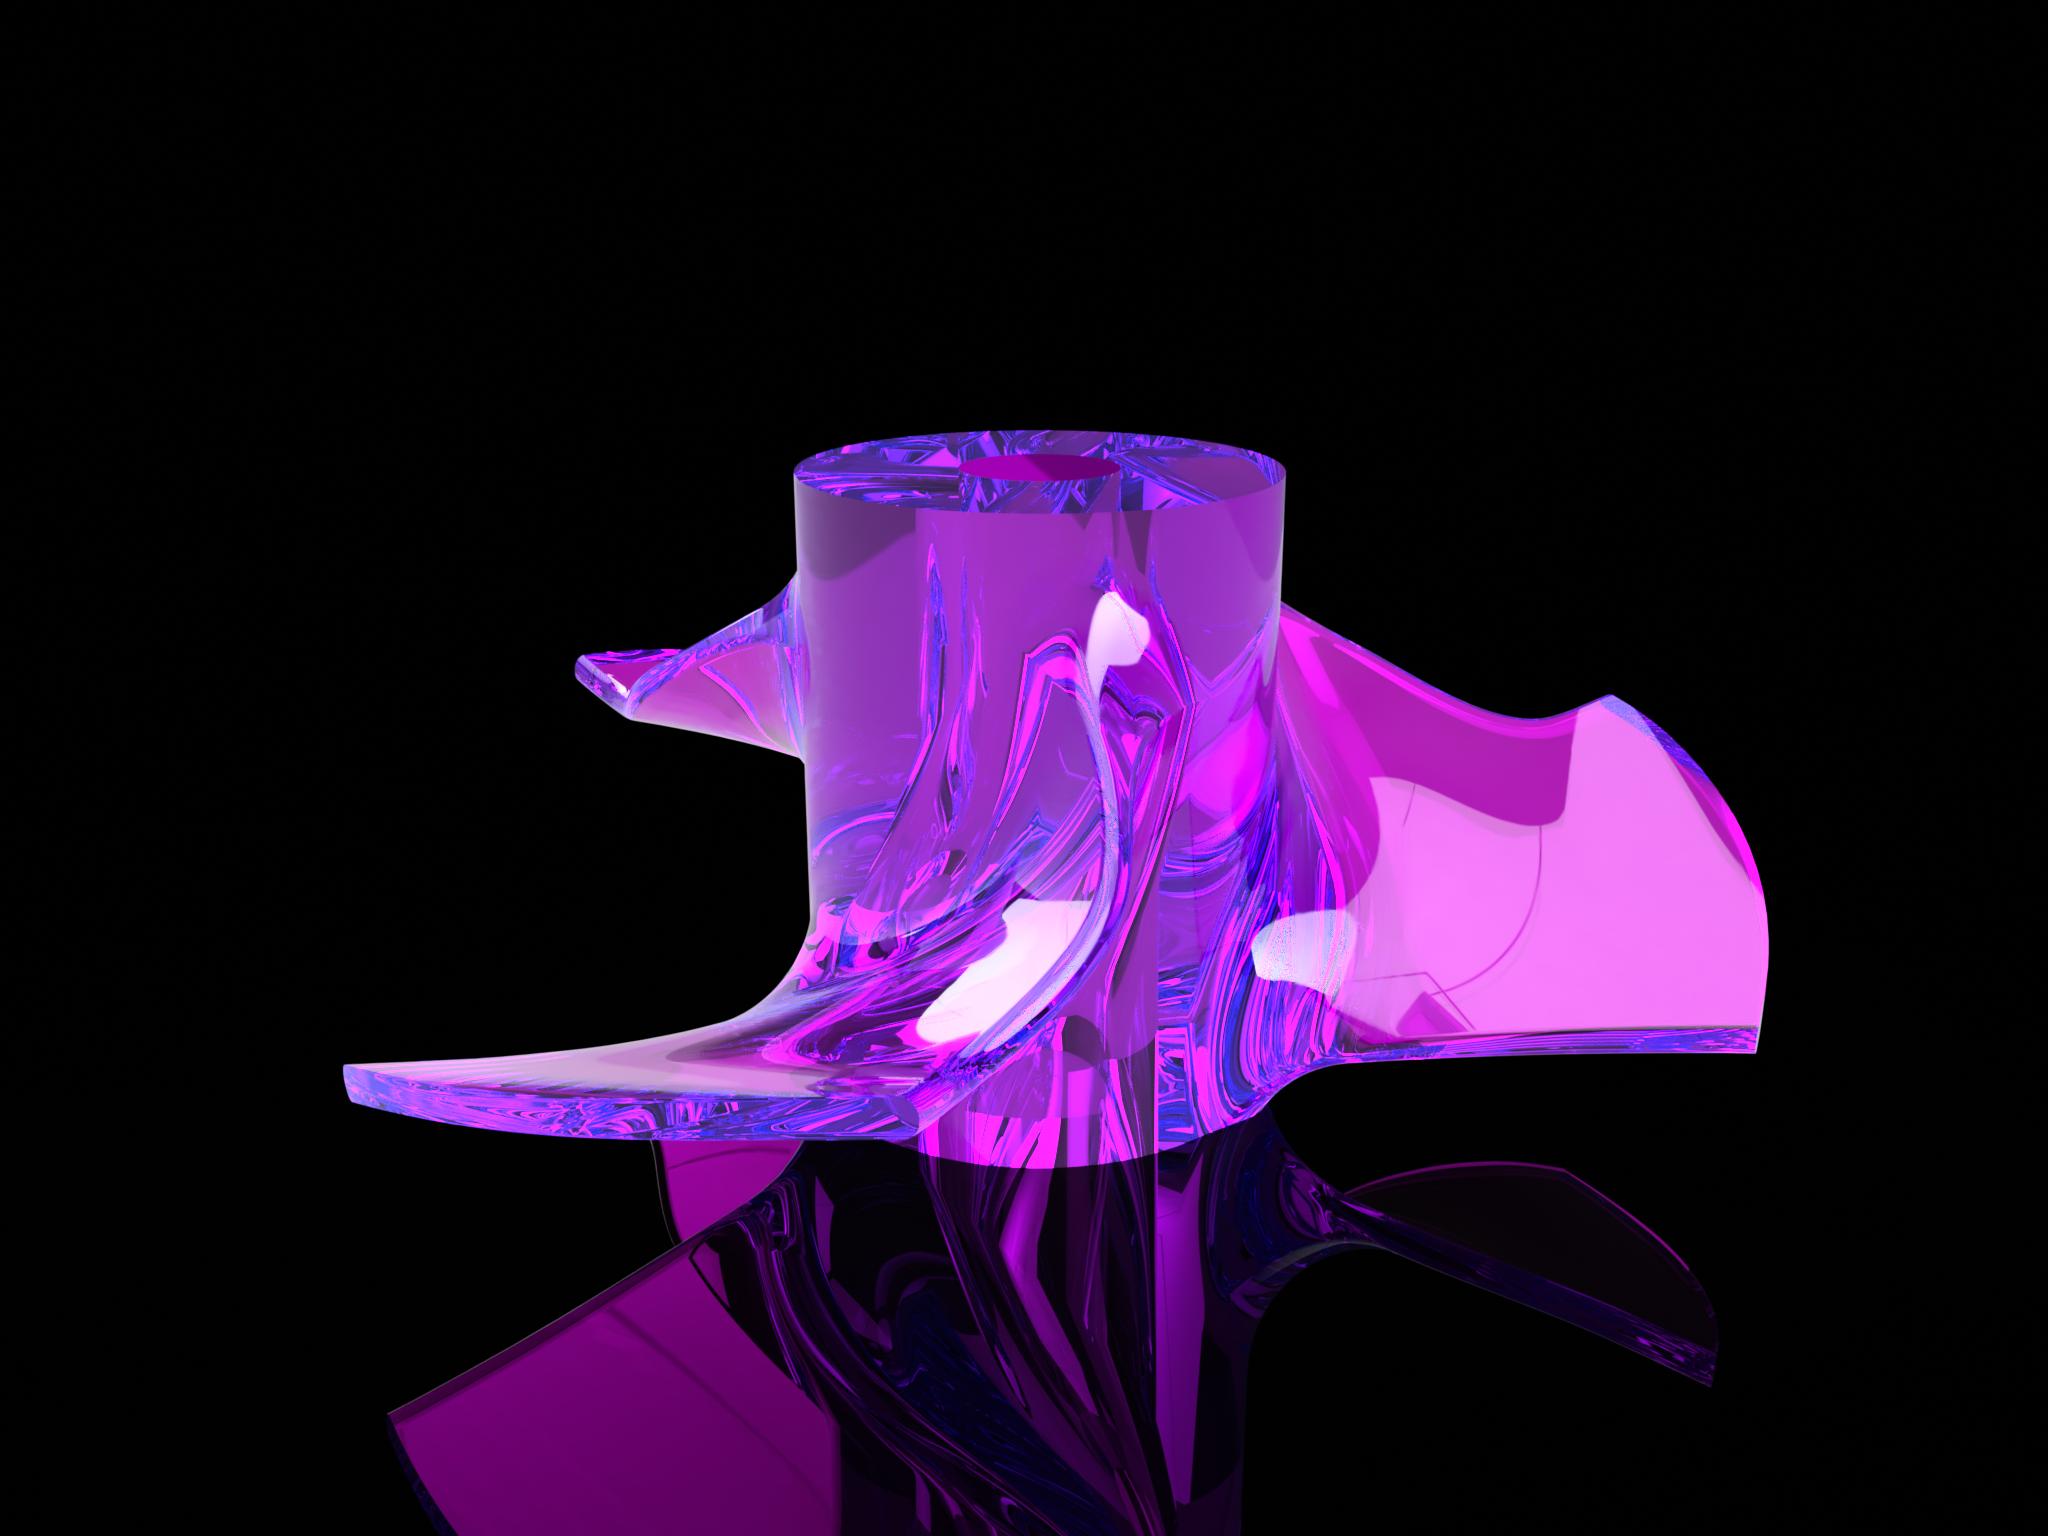 Impeller_3_blade_04